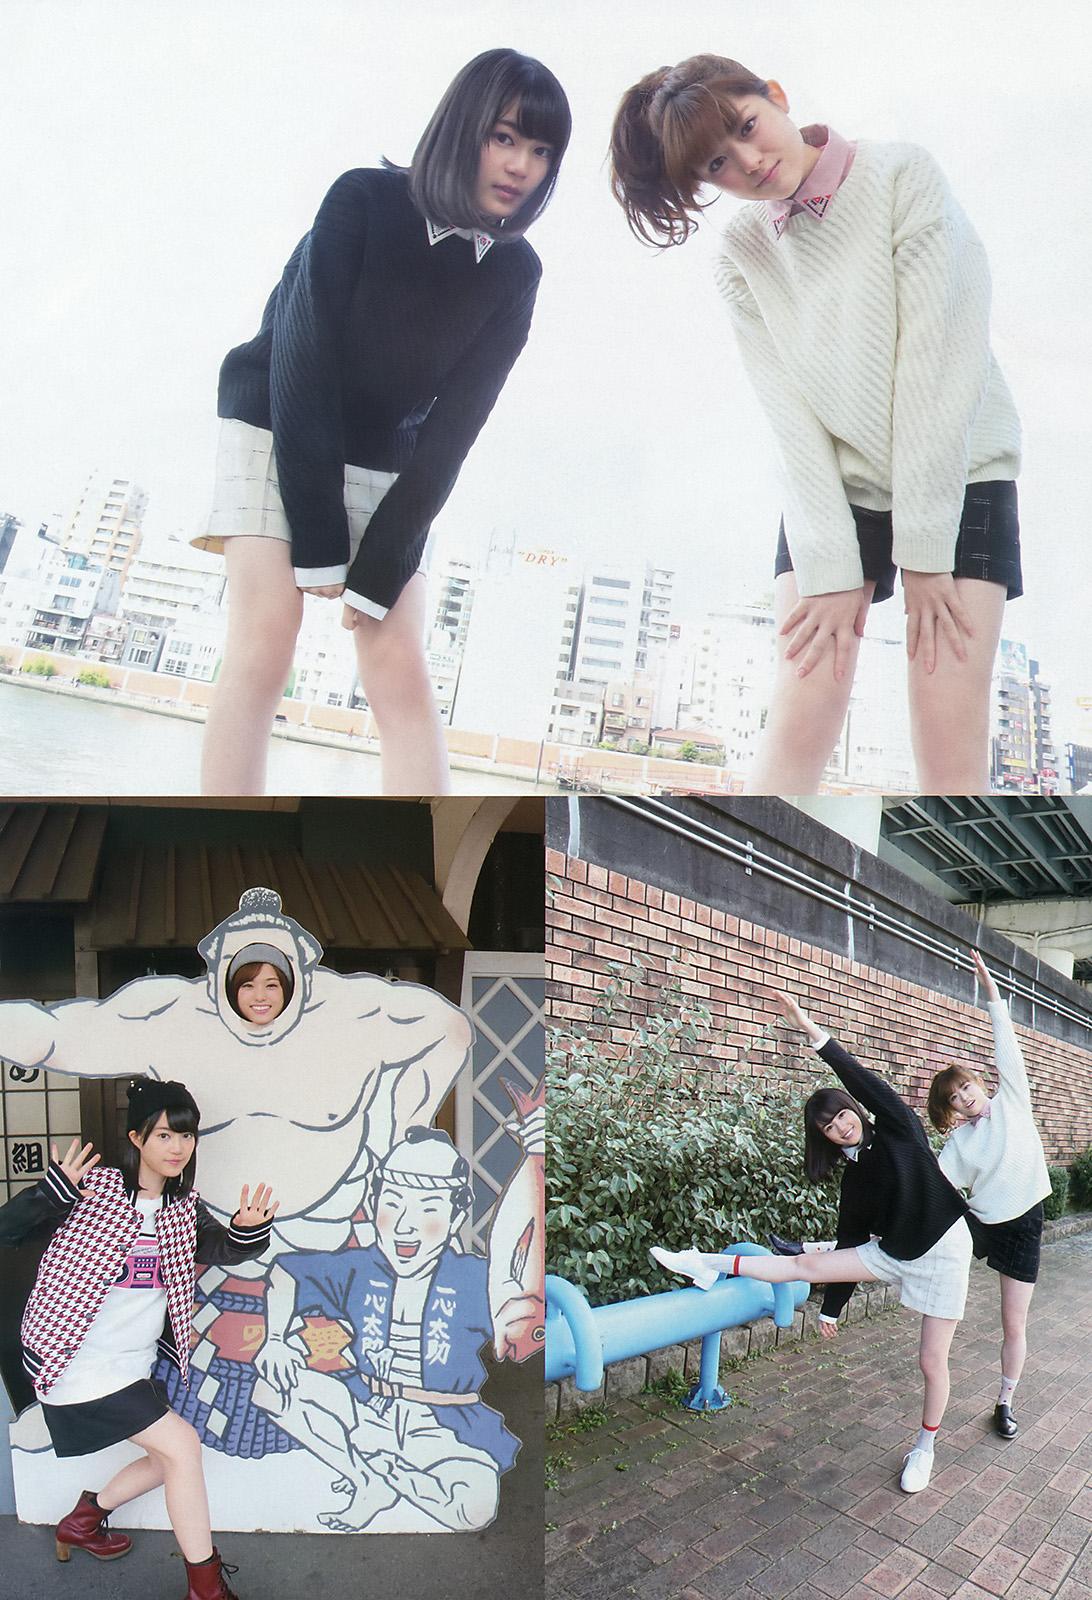 Ikuta Erika 生田絵梨花 x Matsumura Sayuri 松村沙友理 Big Comic Spirits 2016 No 3 Pics 4